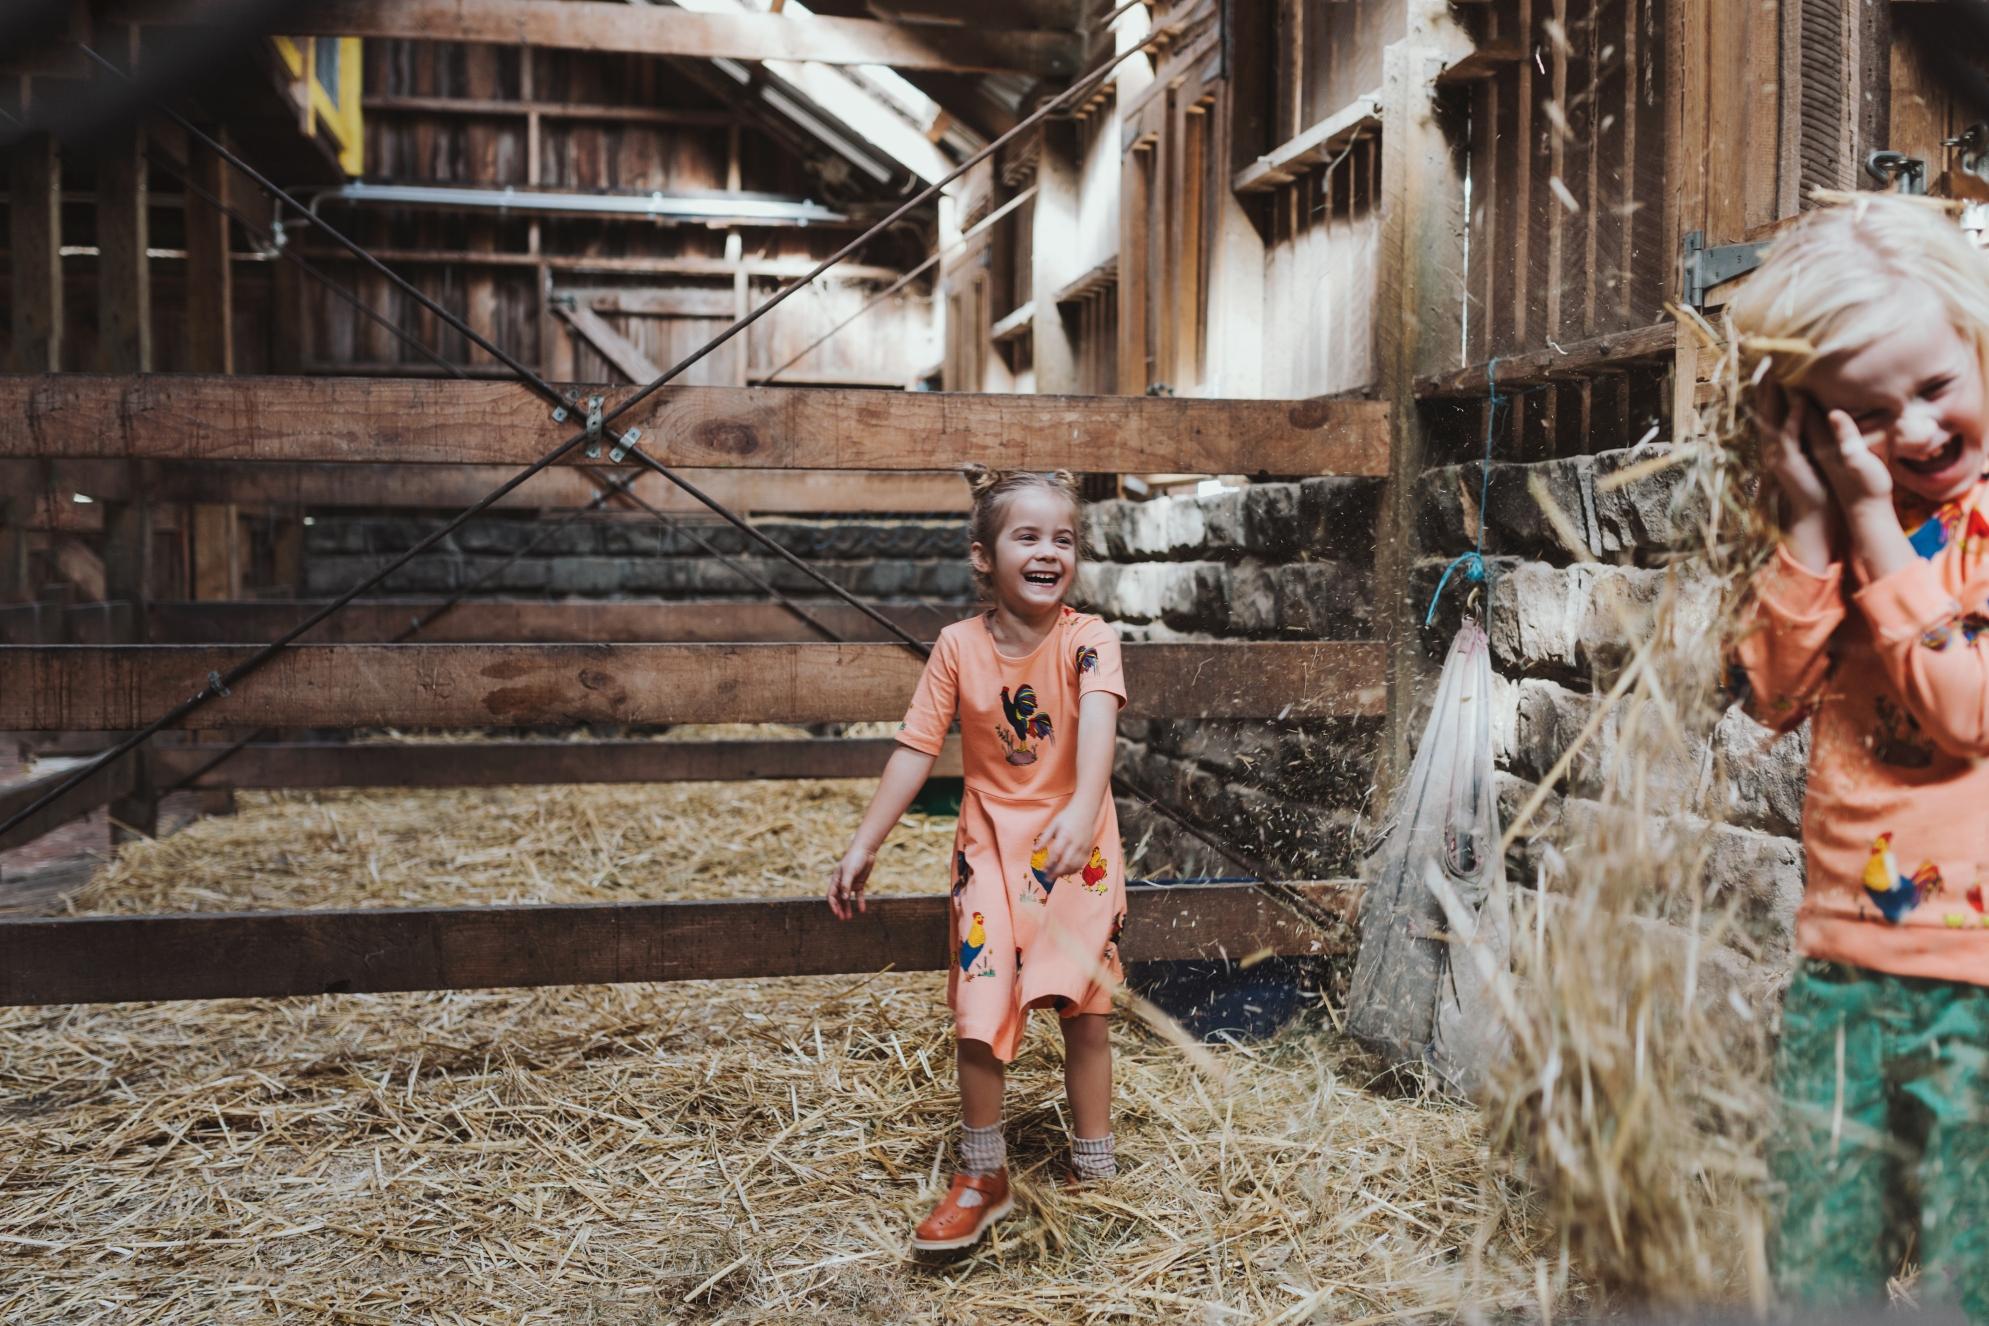 hay-fight-kids-commercial-photographer-siida-tasmania.jpg